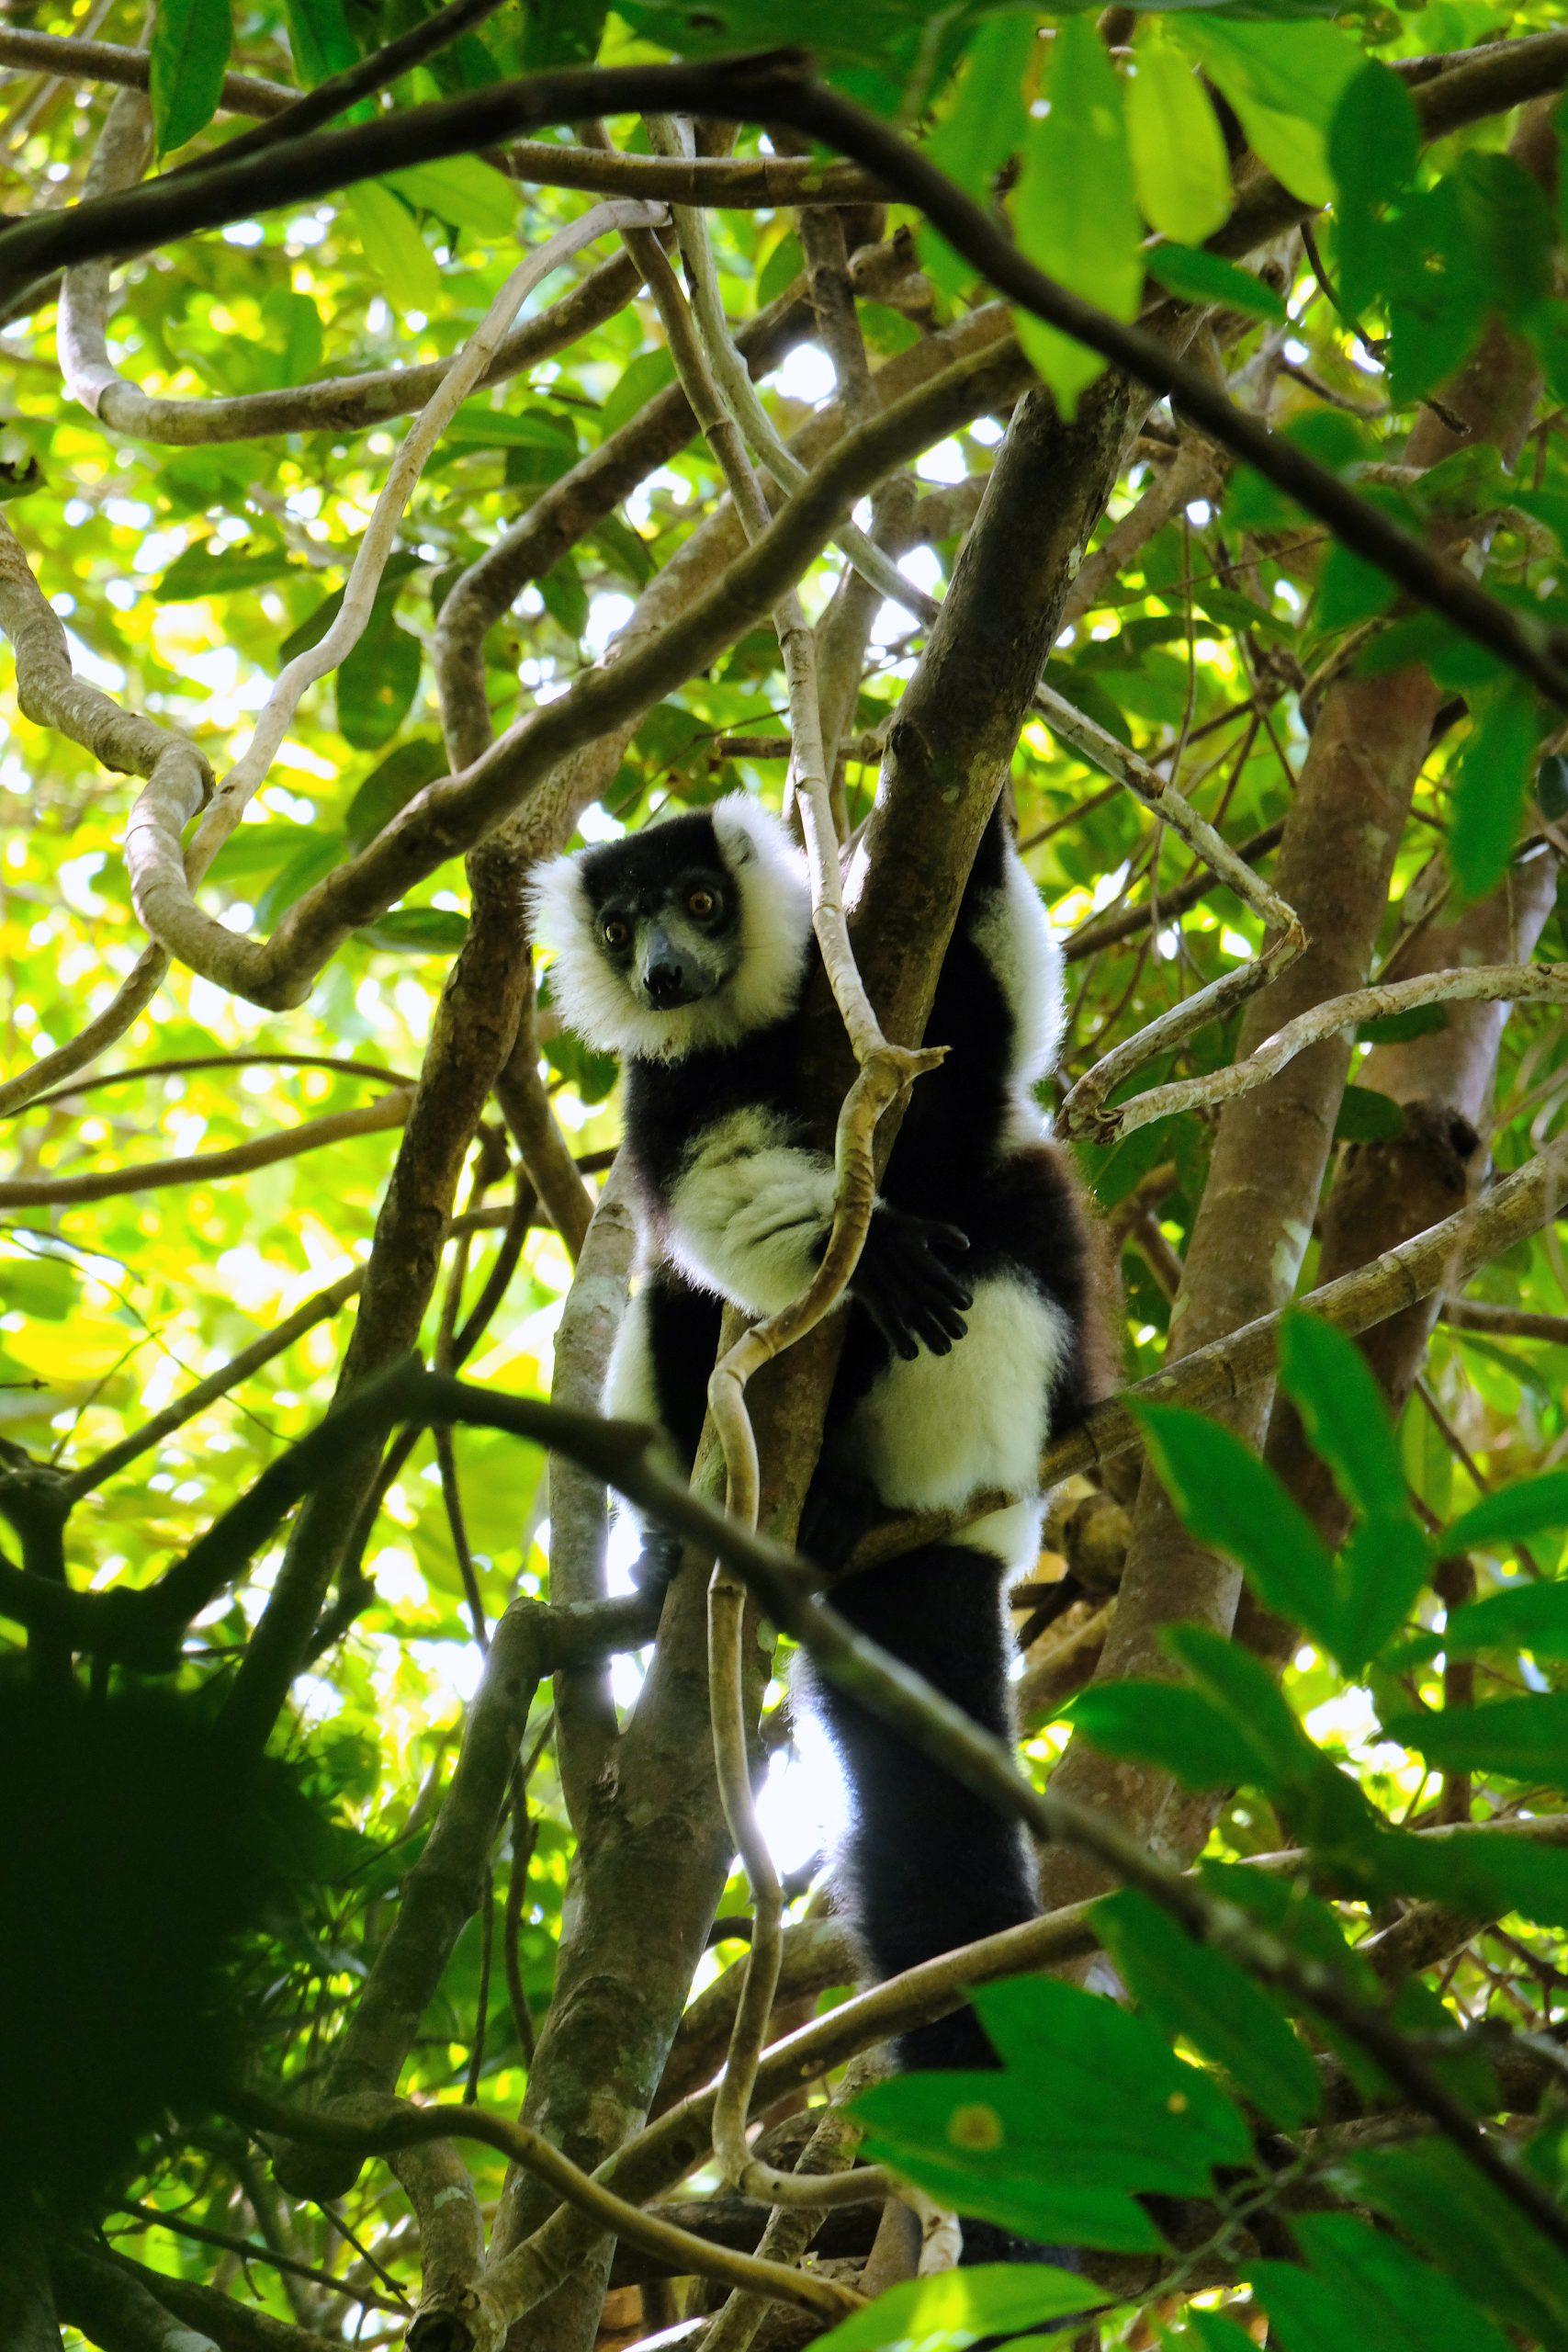 Black and white ruffed lemur in tree